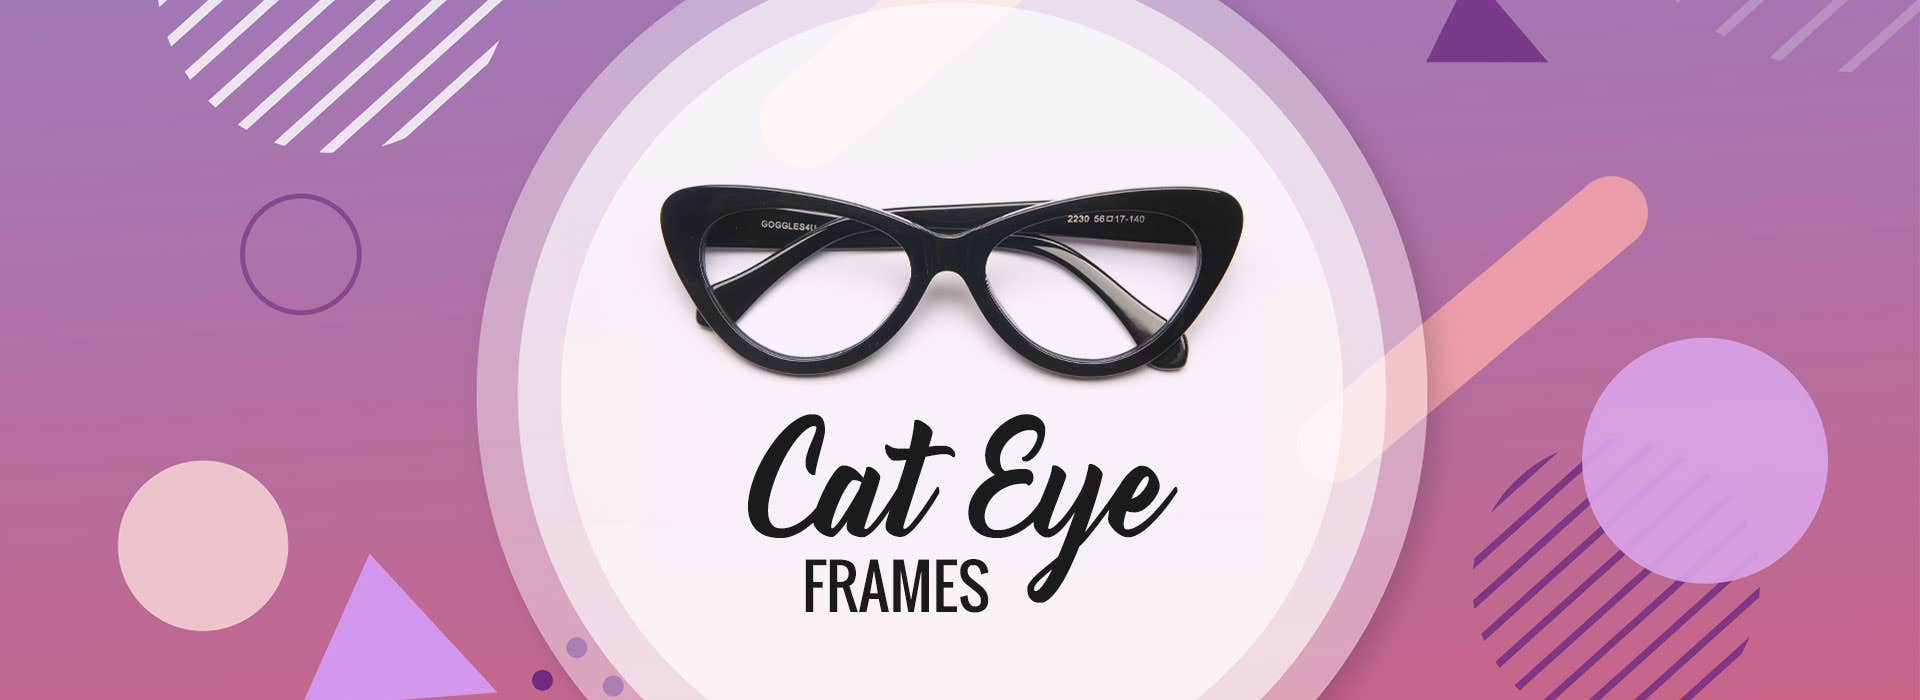 Buy Cateye Eyeglasses at Goggles4U